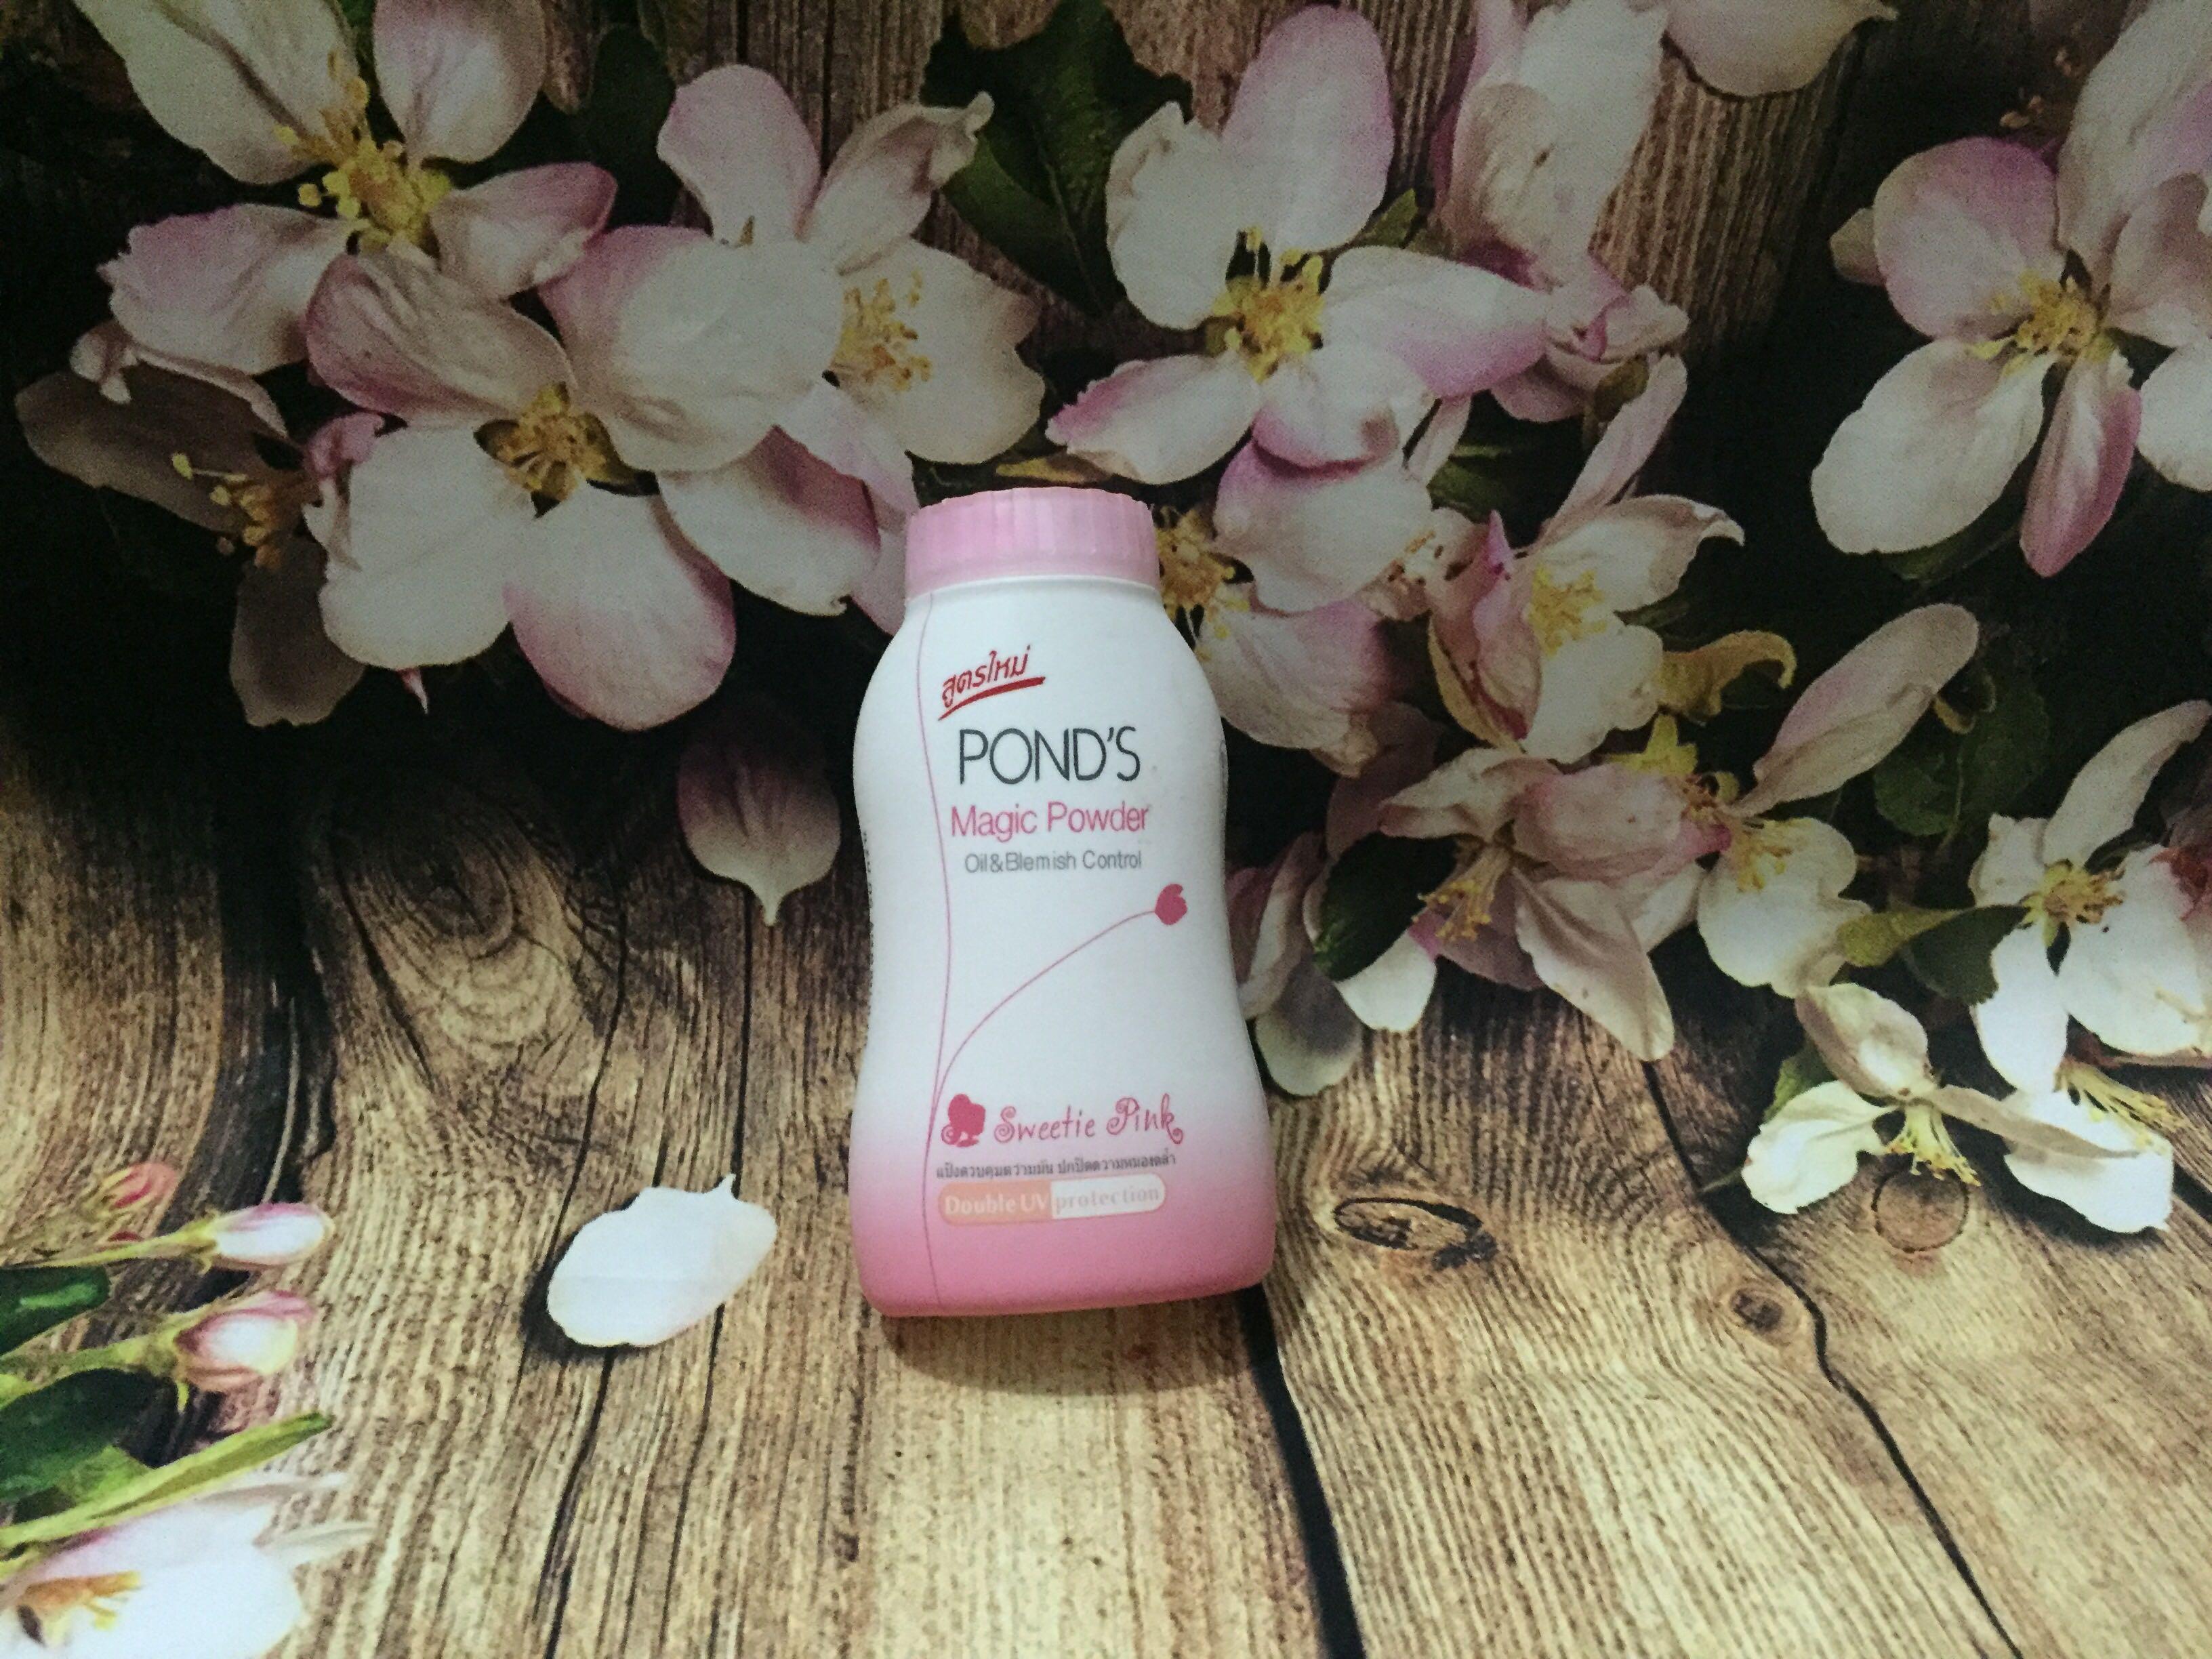 kem-bb-cream-cc-cream-phan-phu-bot-ponds-magic-powder-trang-hong-thai-lan-852